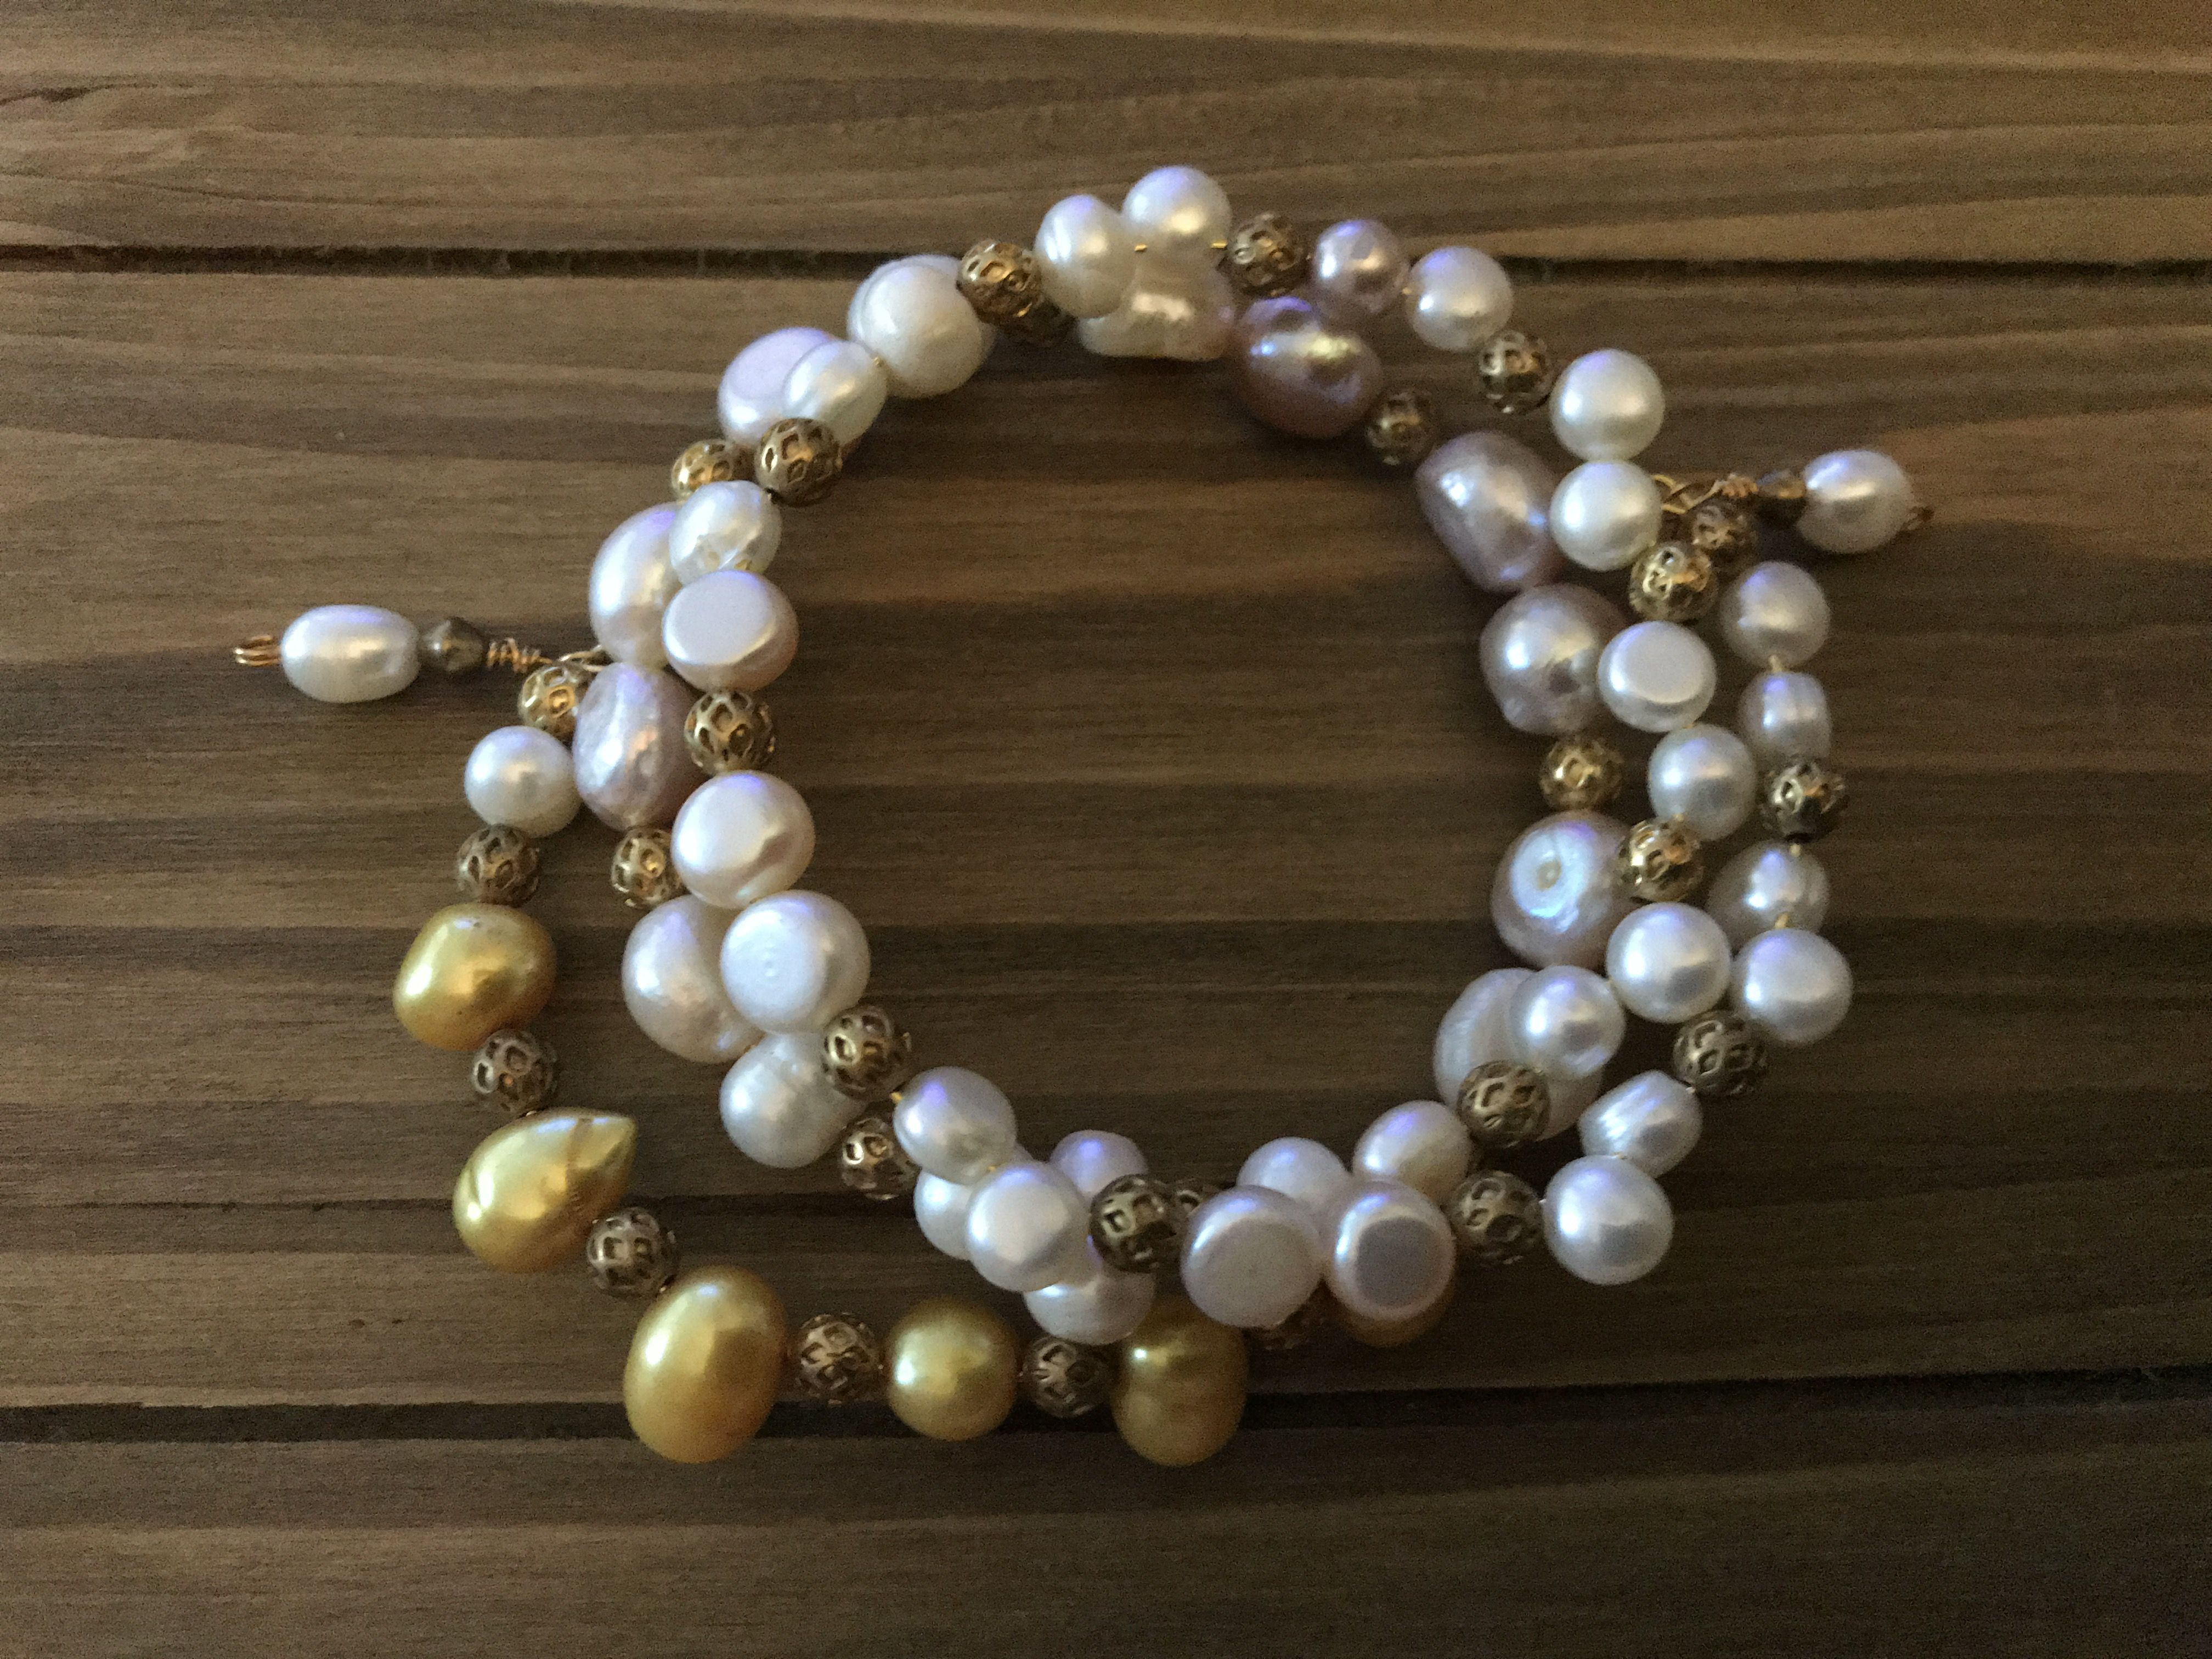 bohostyle cuffbracelets wristlets wrapbracelet pastels energy healingstones pearls unique